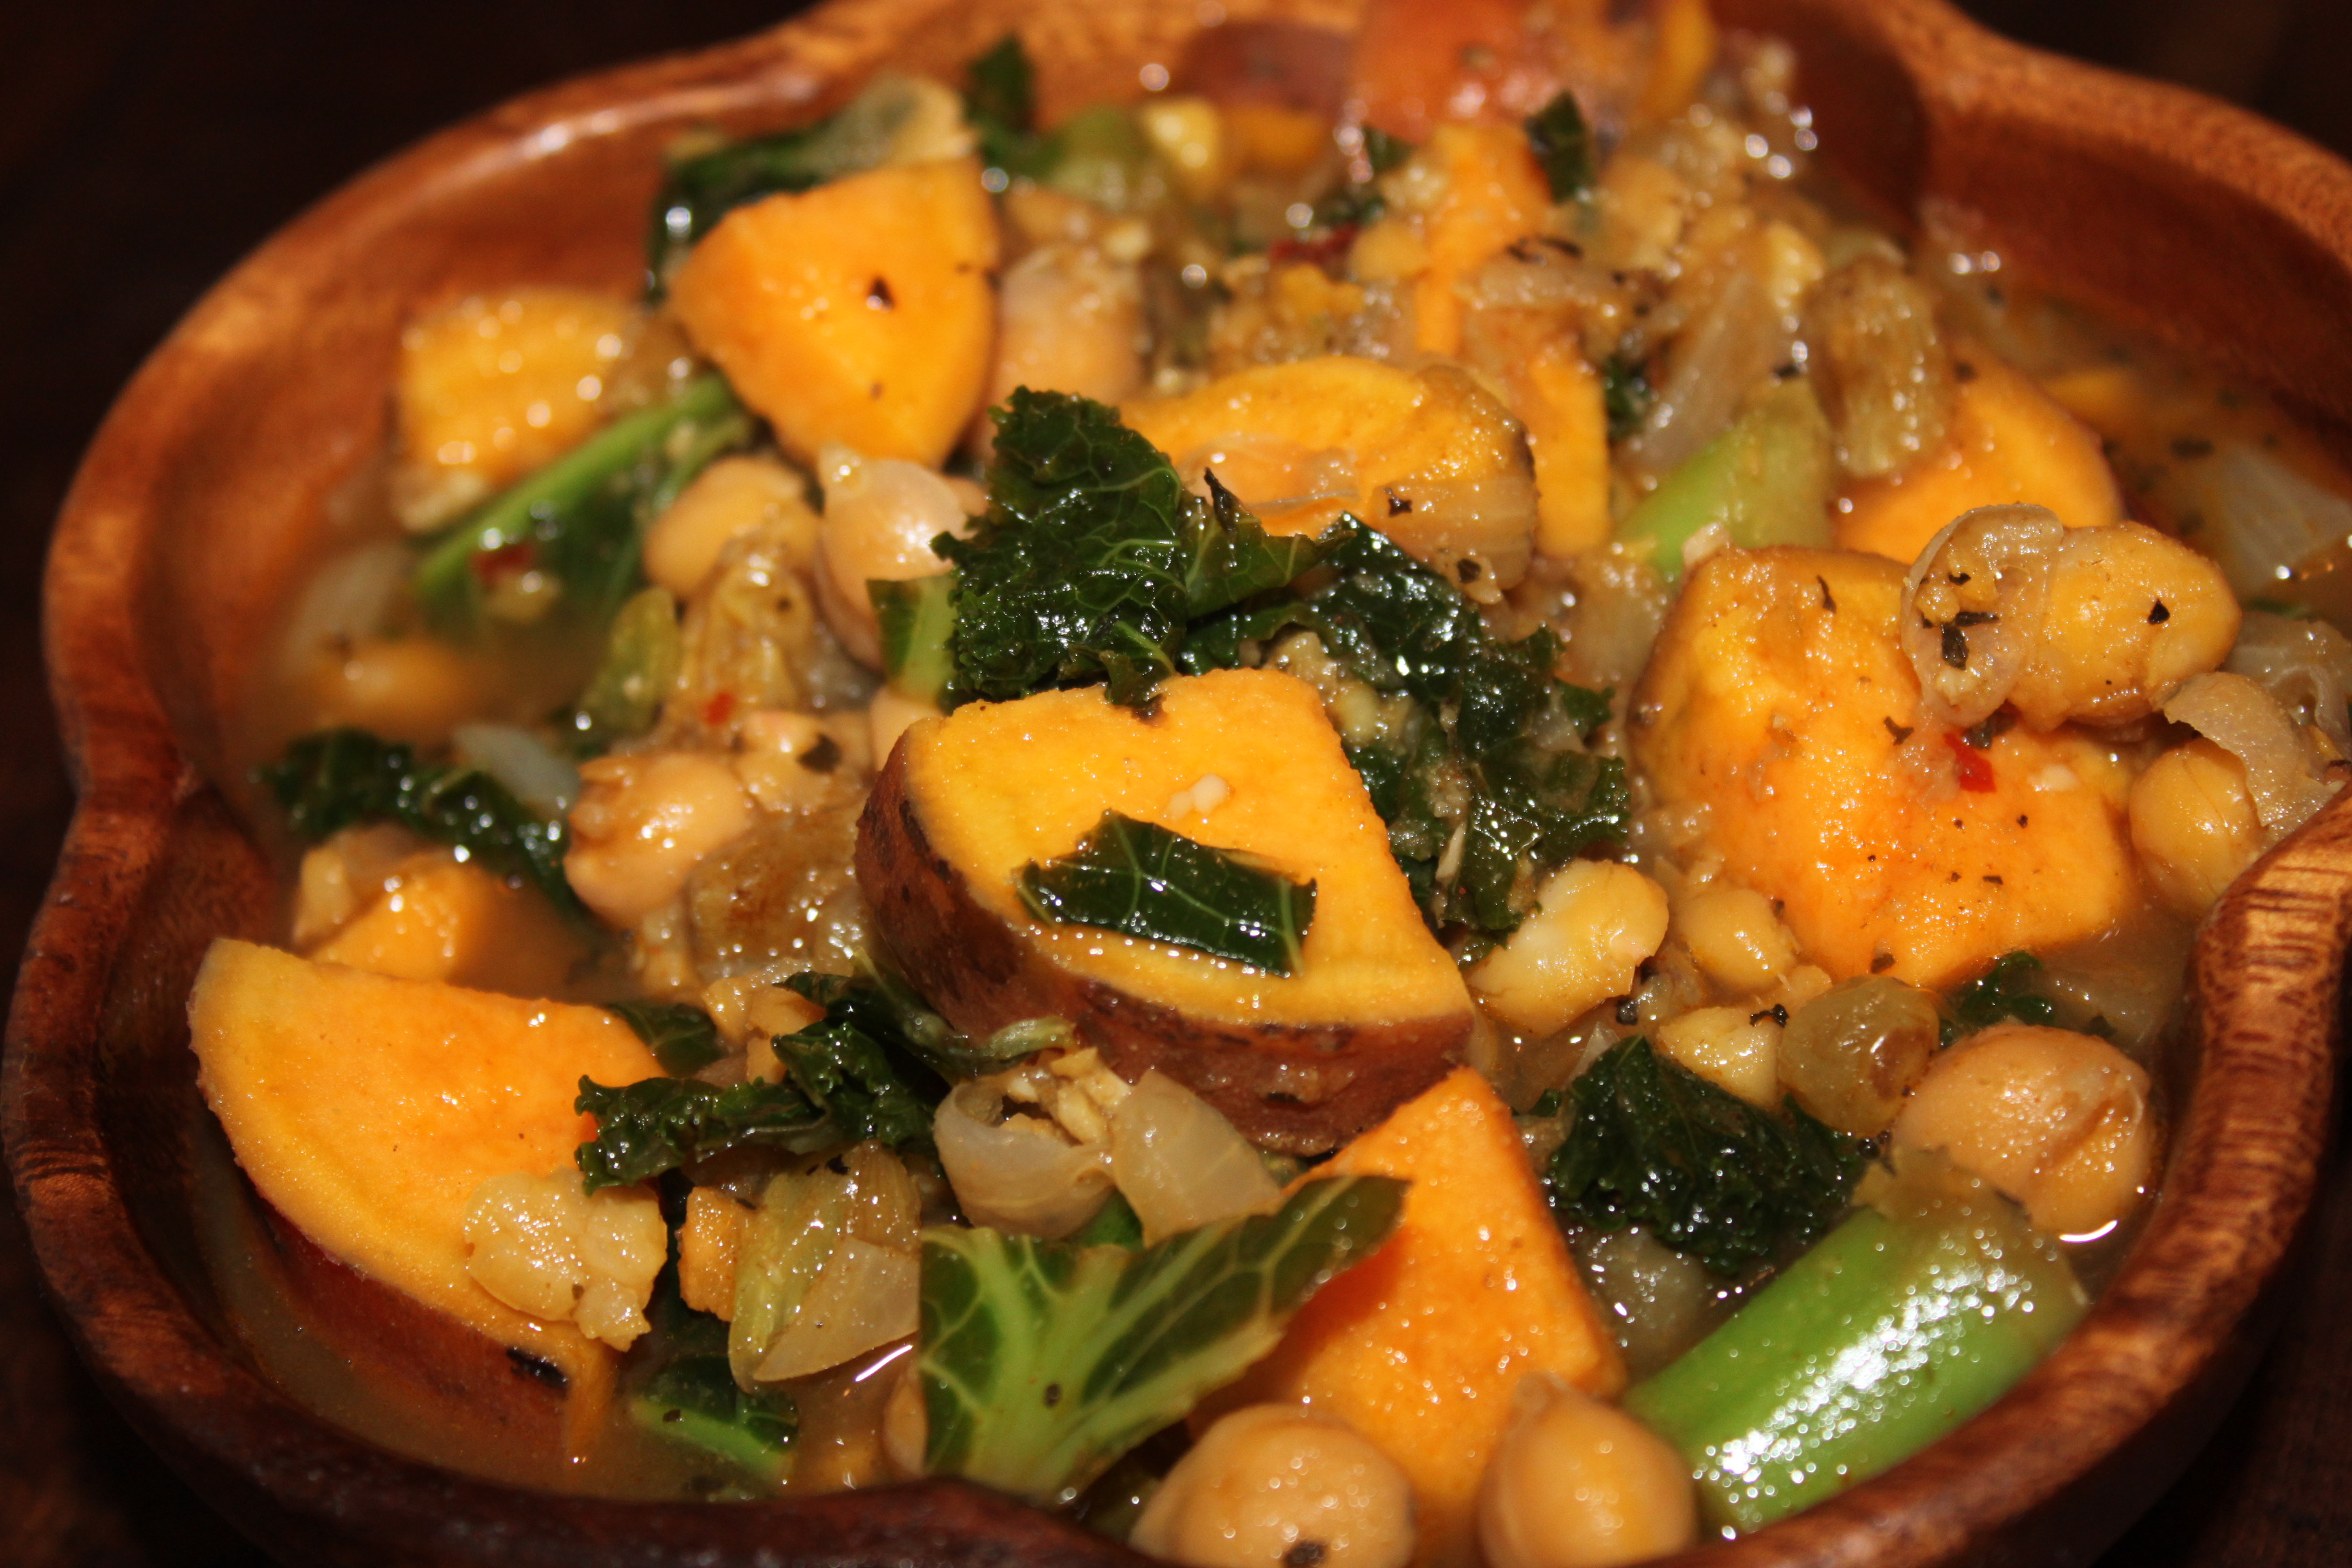 Sweet Potato And Chickpea Stew With Quinoa Recipes — Dishmaps